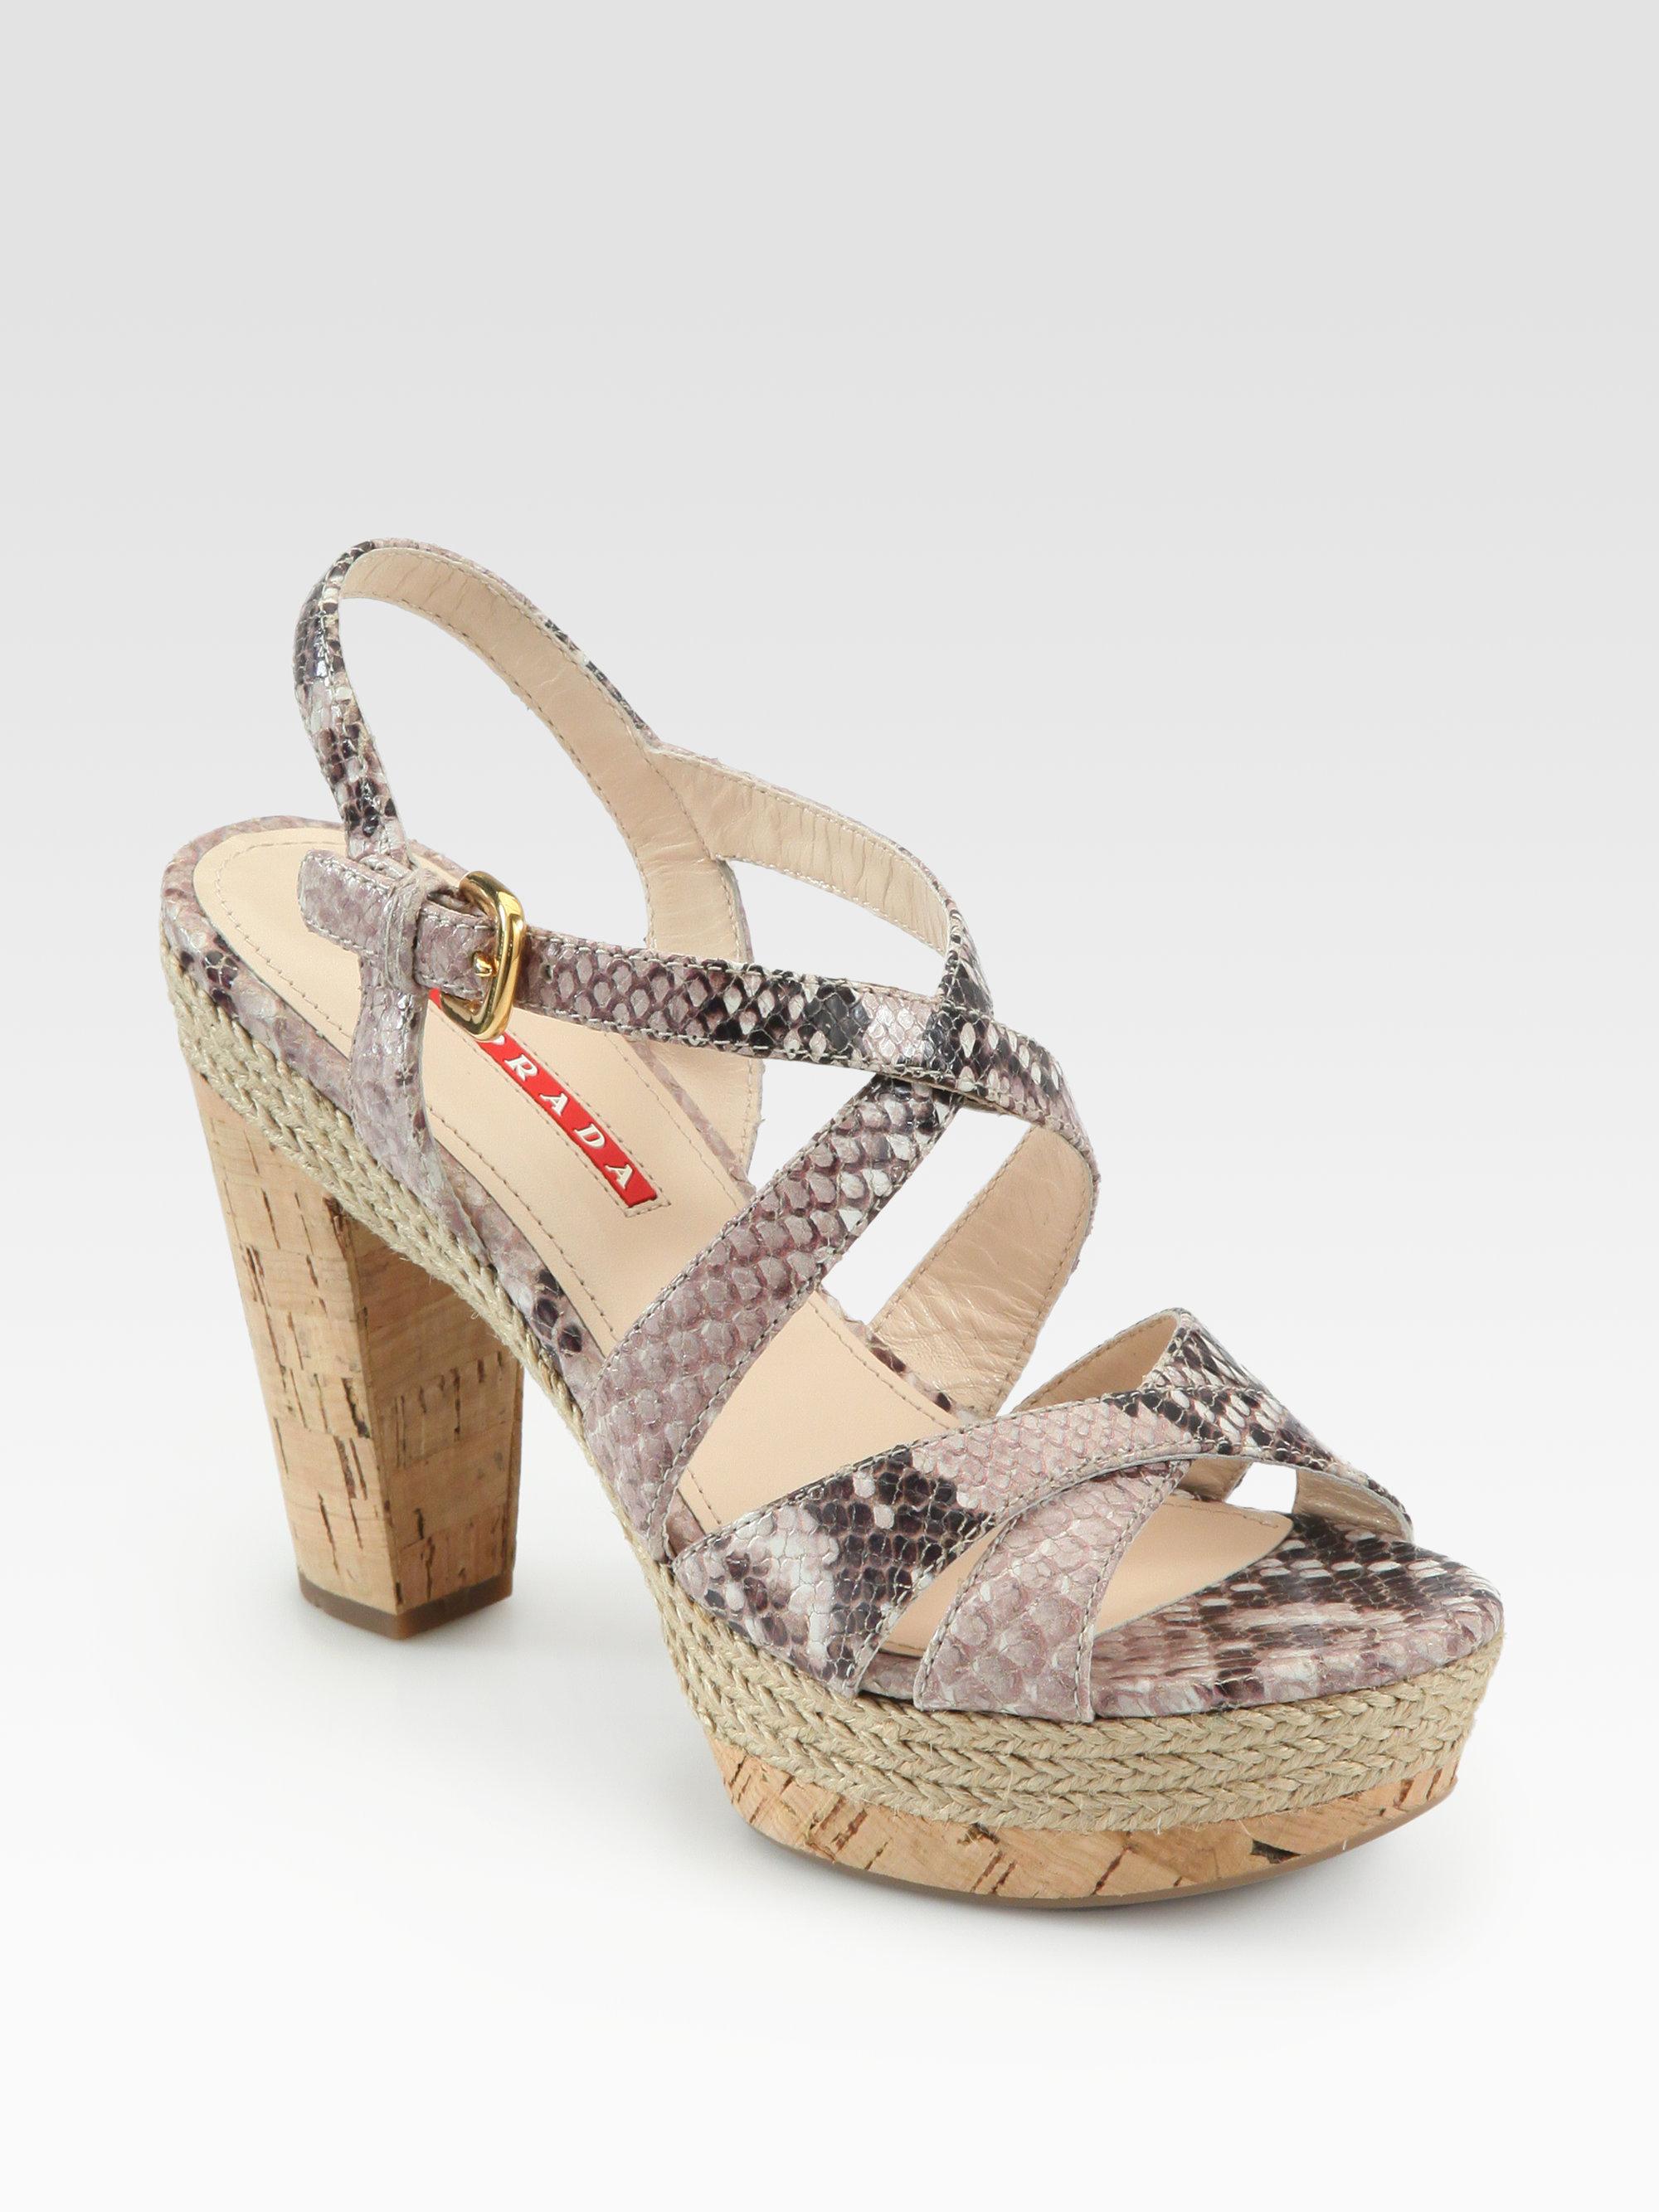 Prada Python T-Strap Sandals buy cheap marketable cheap supply find great cheap online new arrival cheap online pQiX8mdE